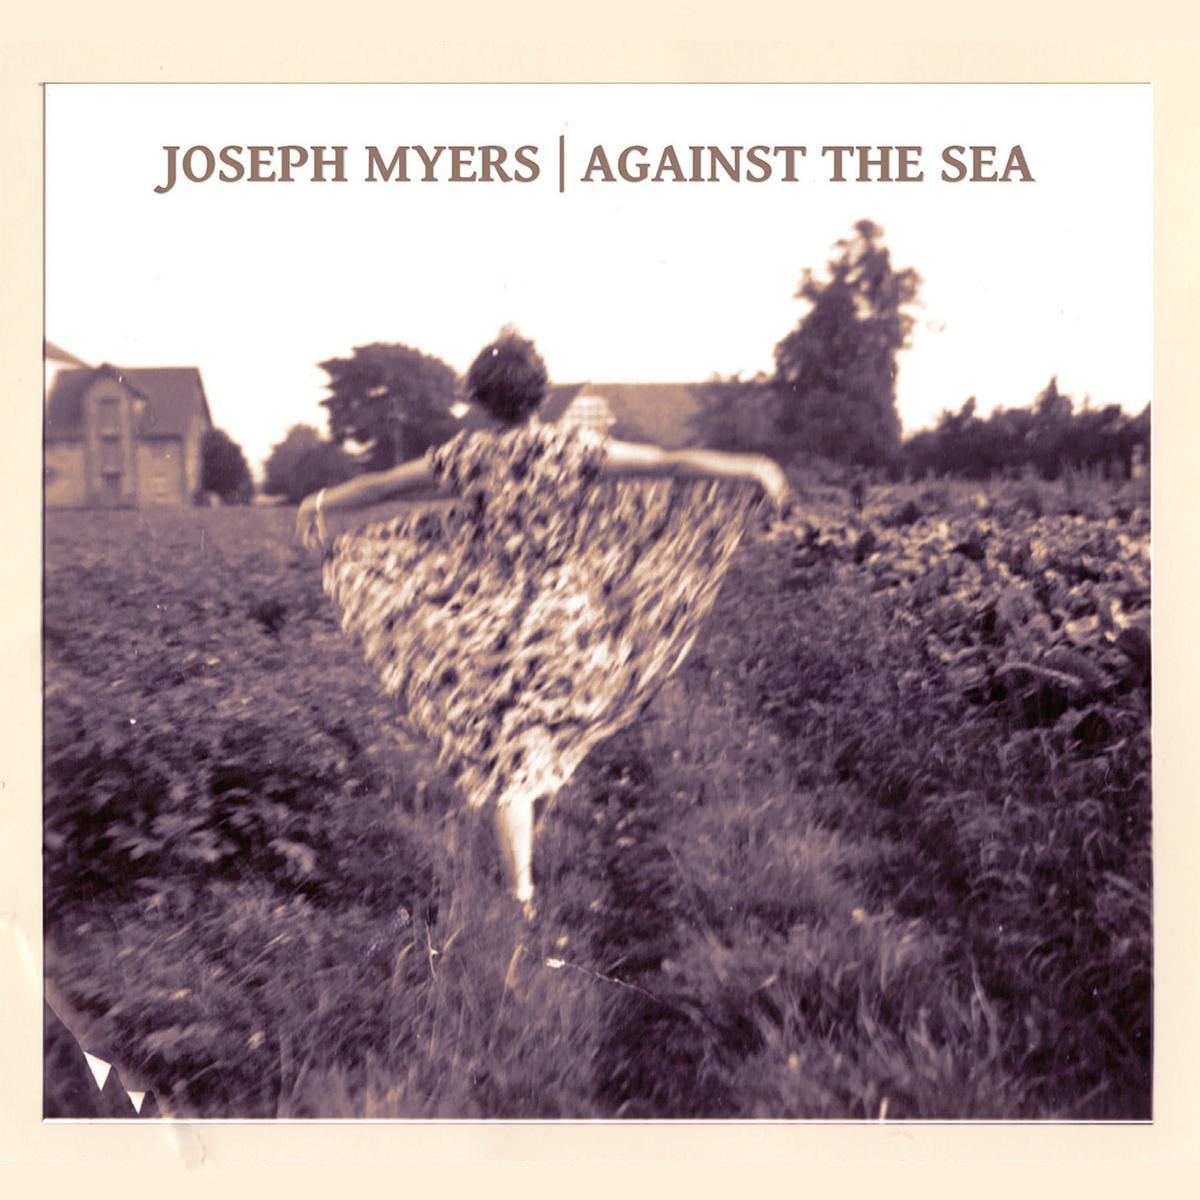 Joseph Myers